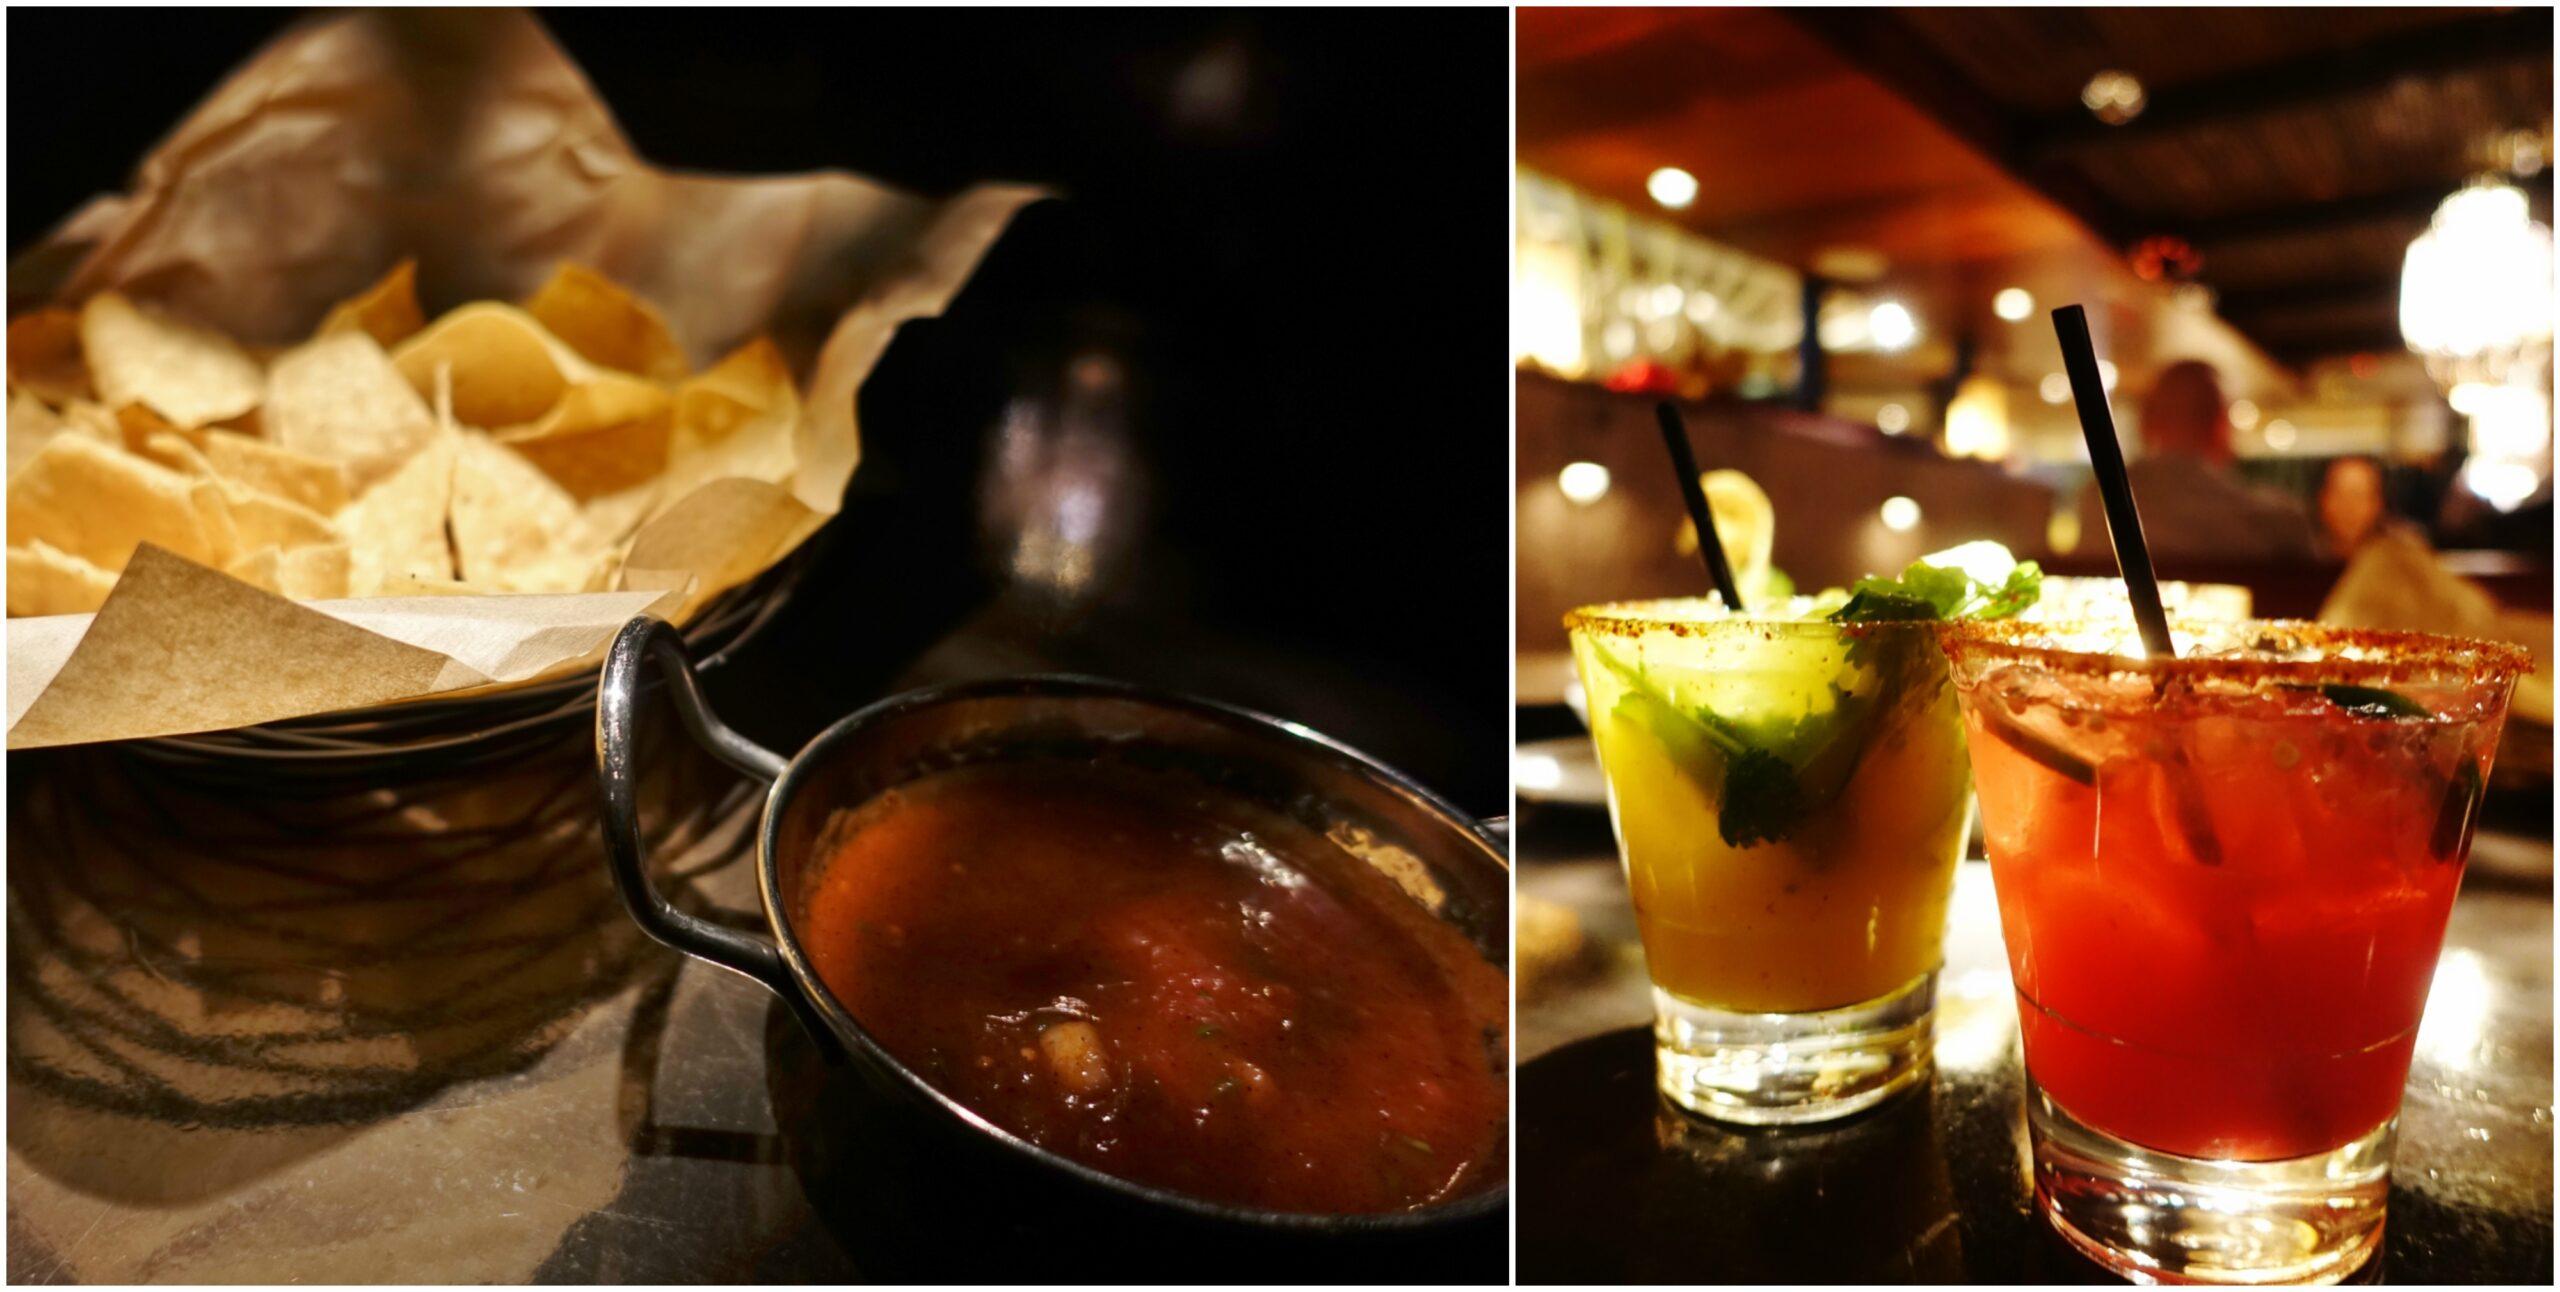 Chips & Salsa, Margaritas - Tortilla Republic, Laguna Beach, CA